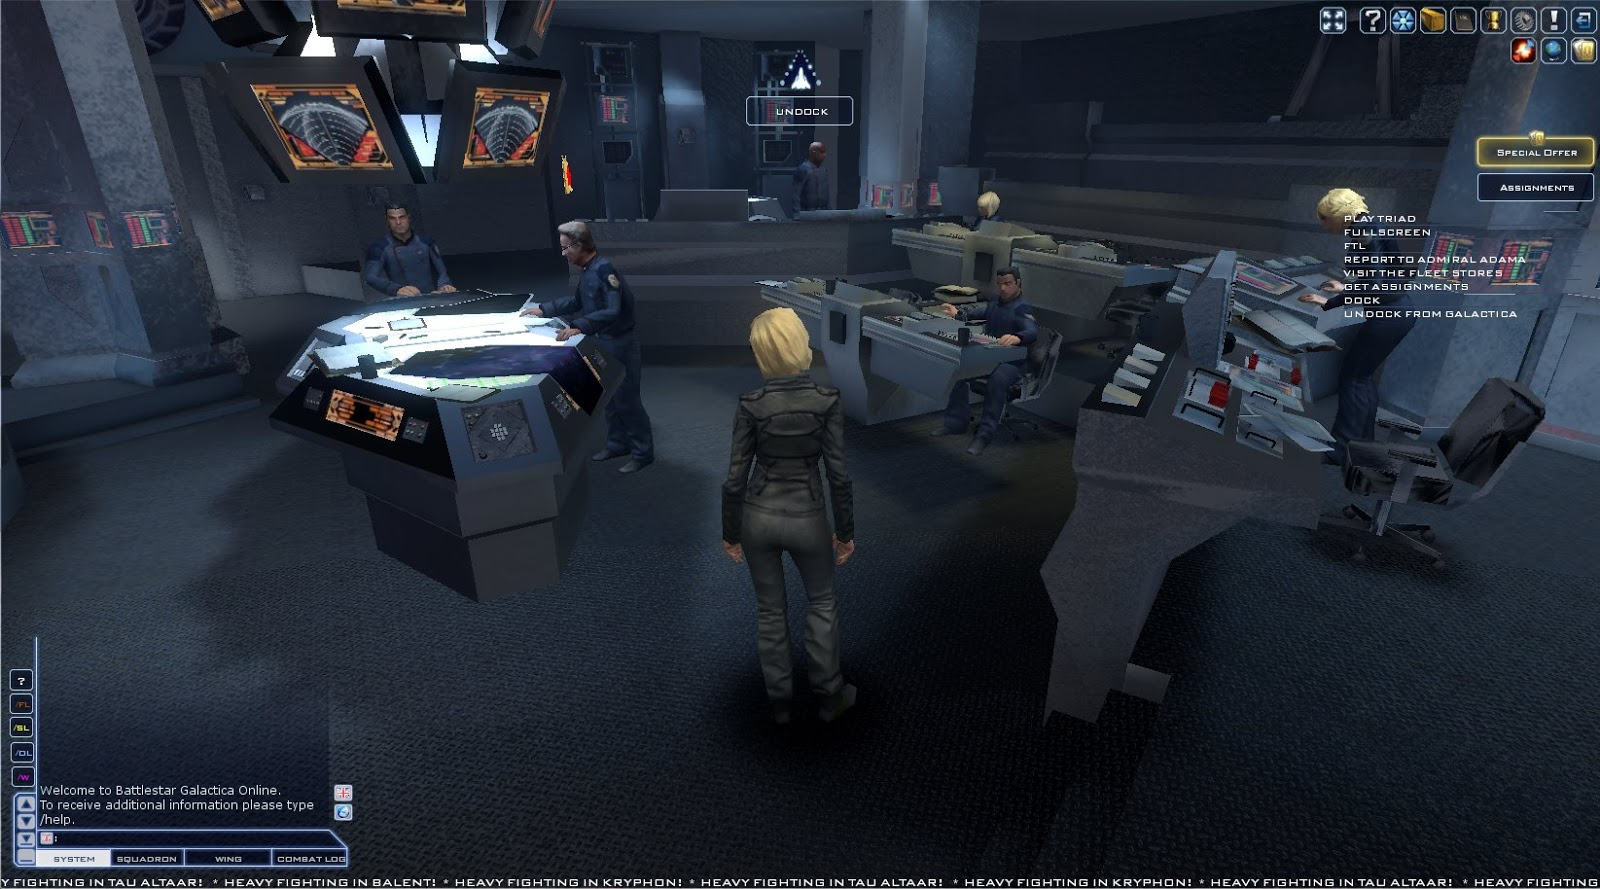 Battlestar Galactica Online - Galactica CIC